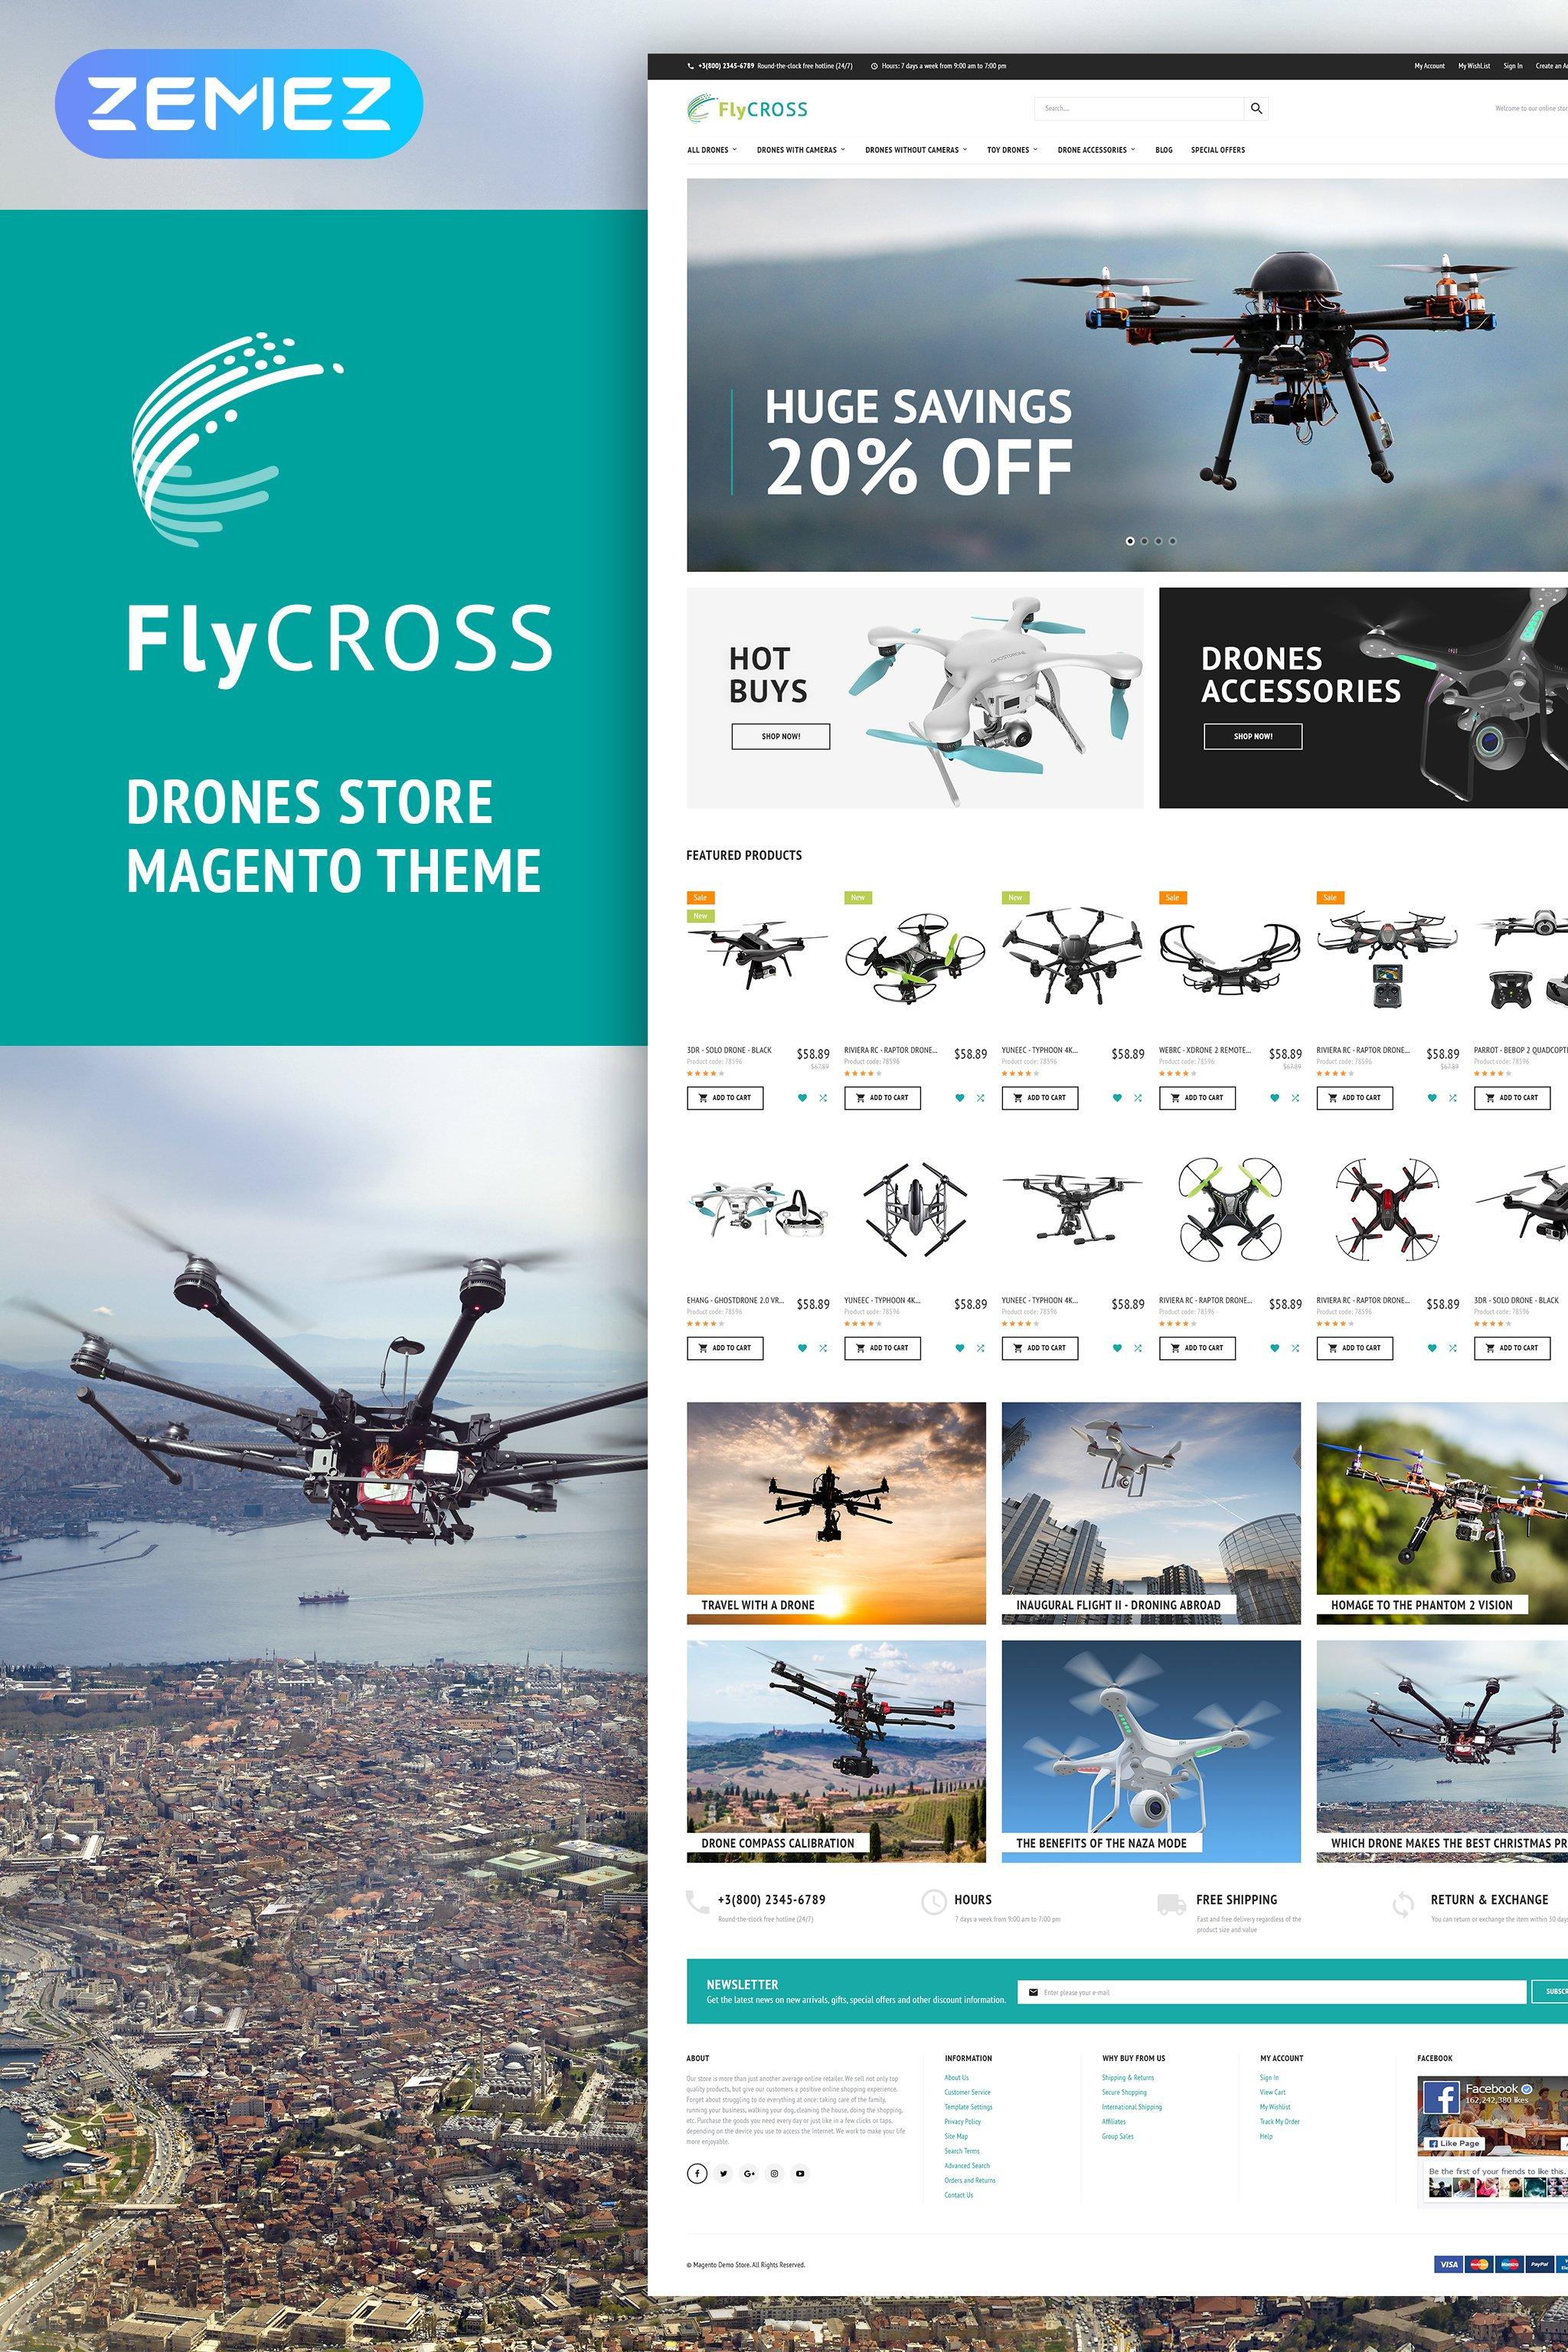 FlyCross - Drones Store Magento Theme